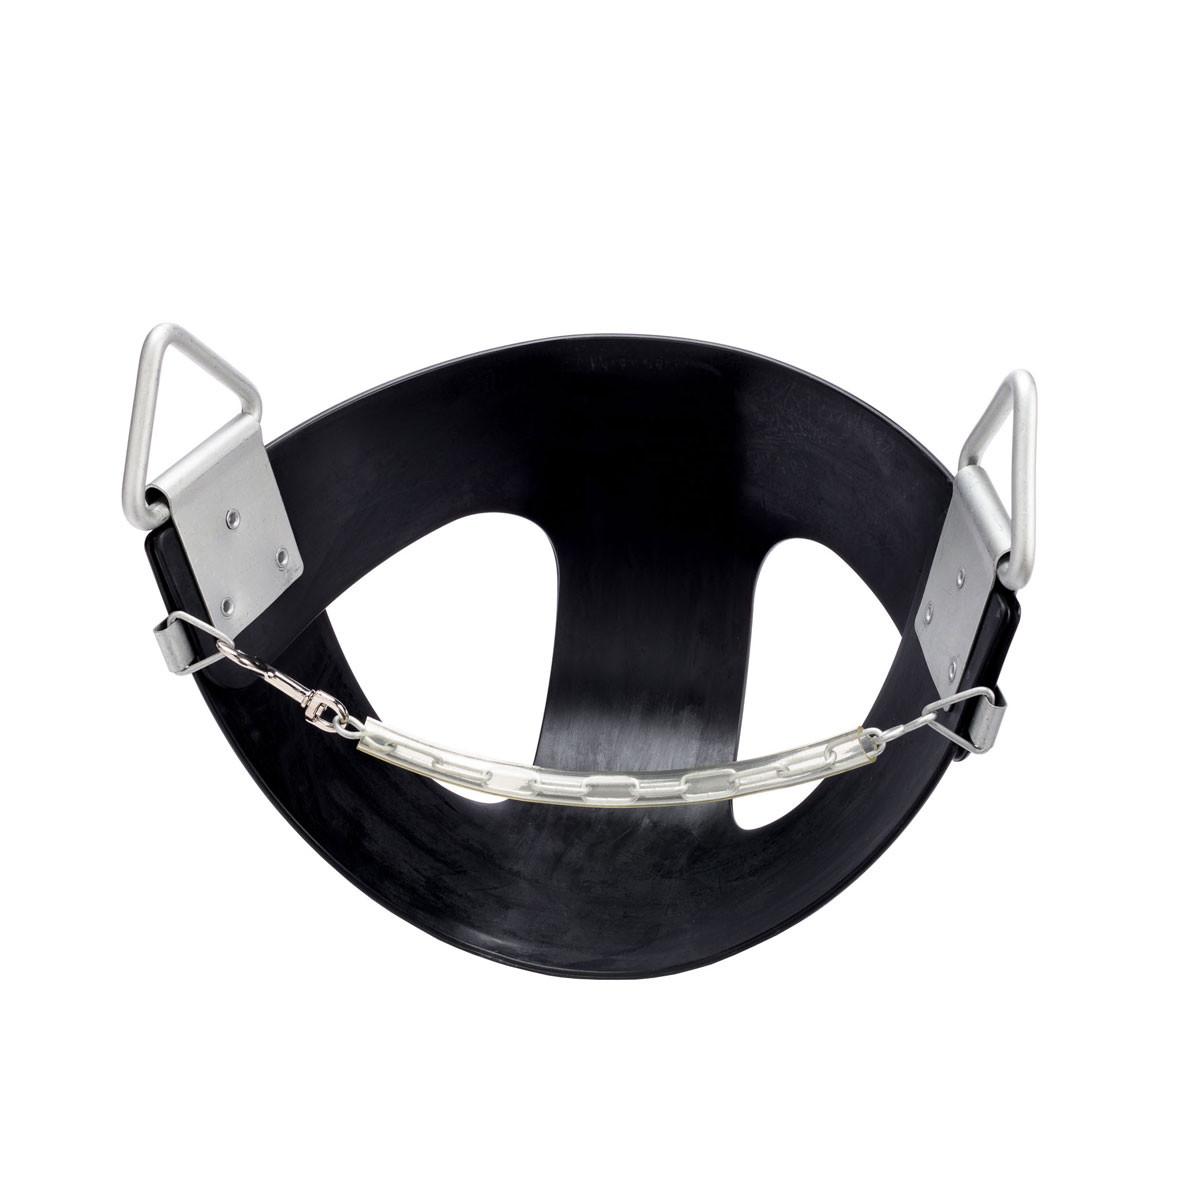 Commercial Rubber Half Bucket Swing Seat - Black